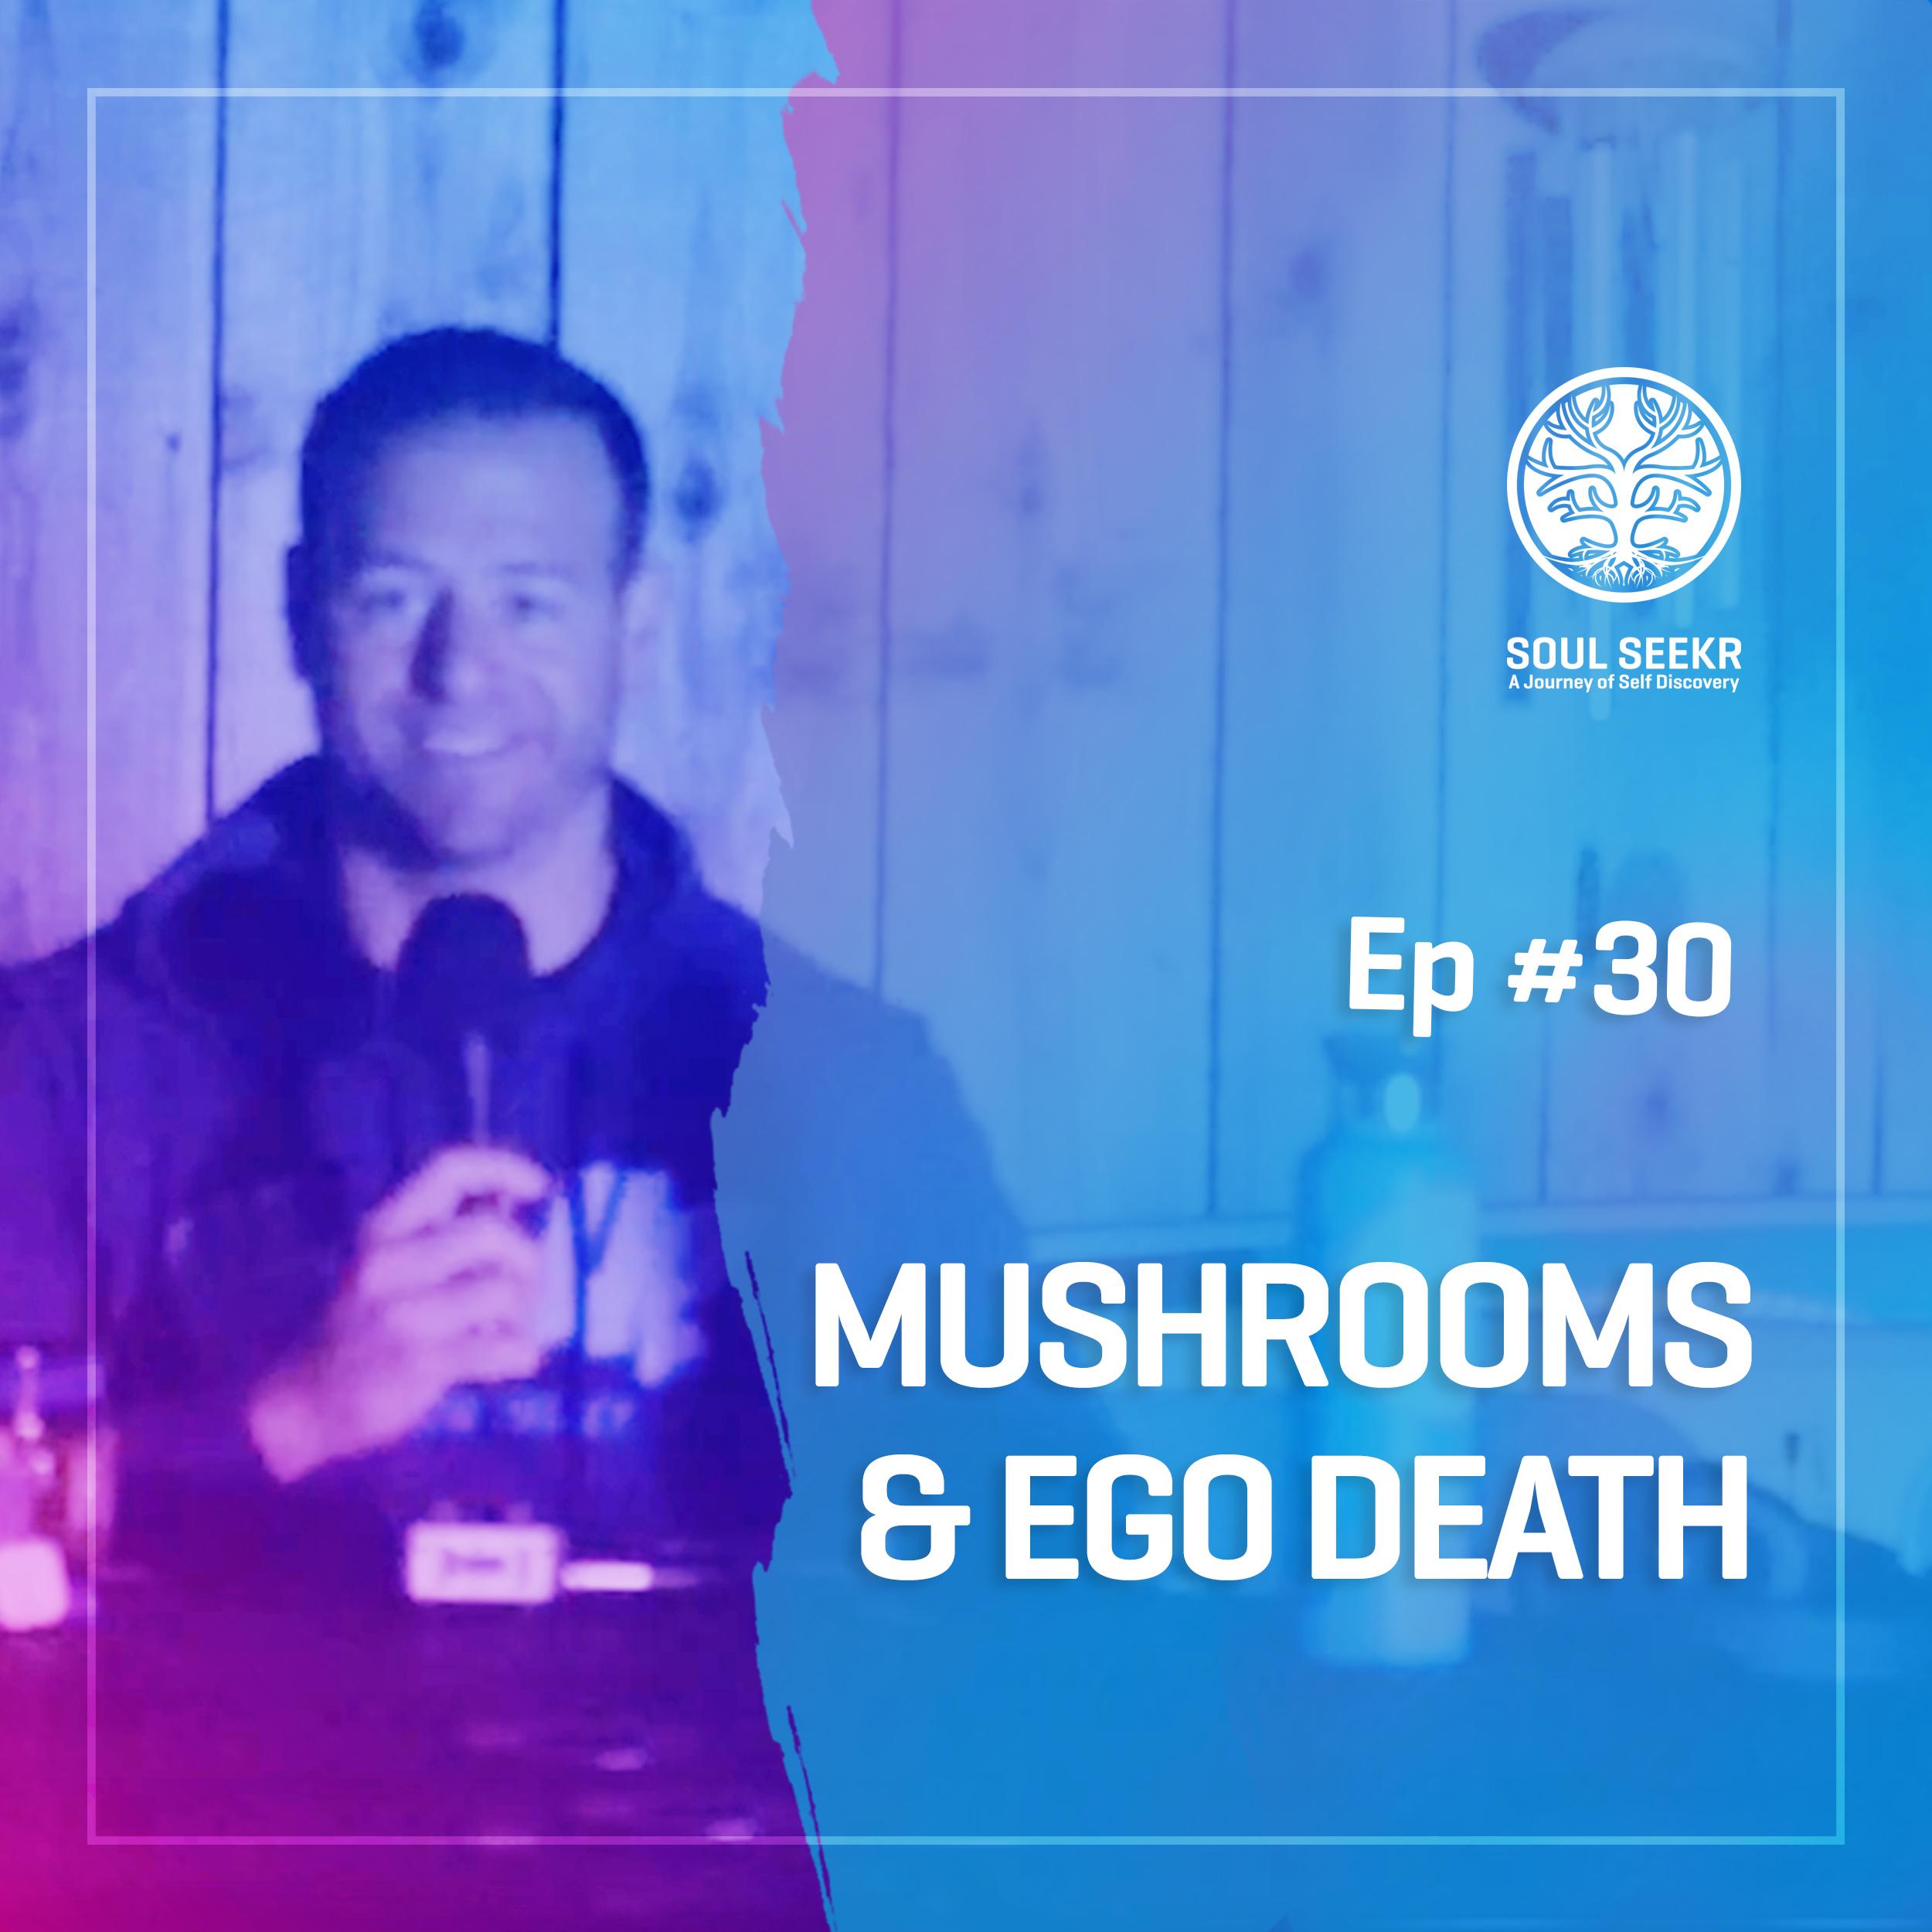 #30: Mushrooms & Ego Death